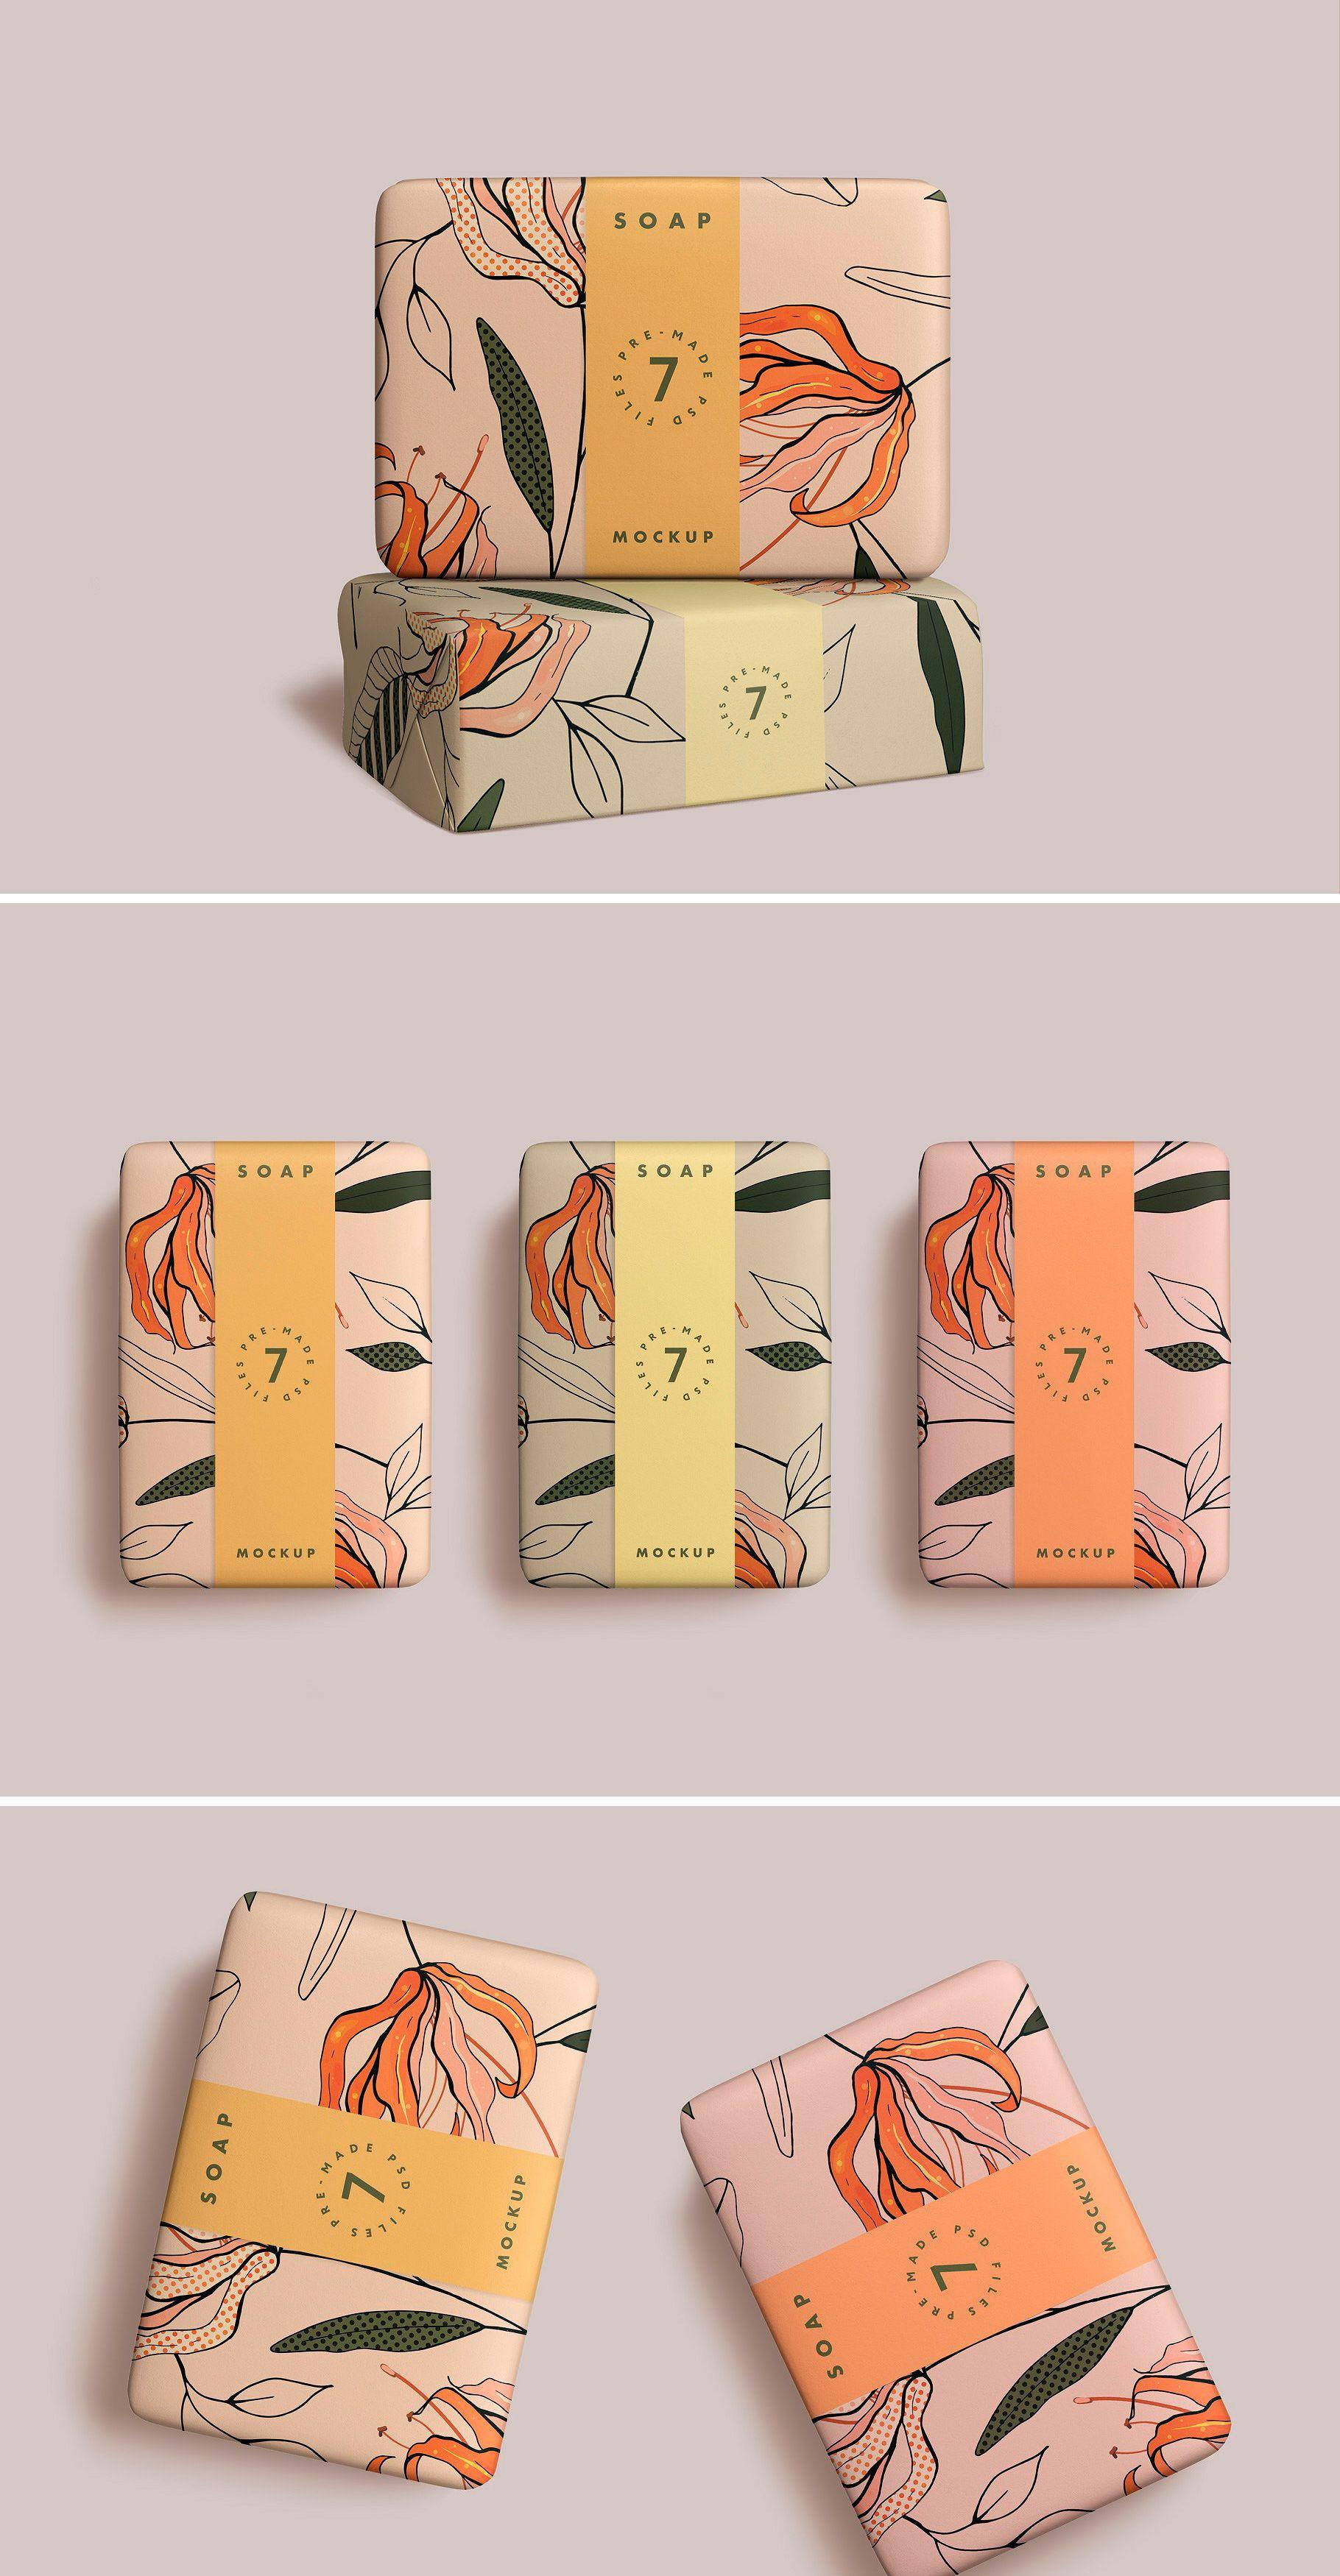 Soap Bar Mockup Soap Packaging Design Graphic Design Packaging Creative Packaging Design